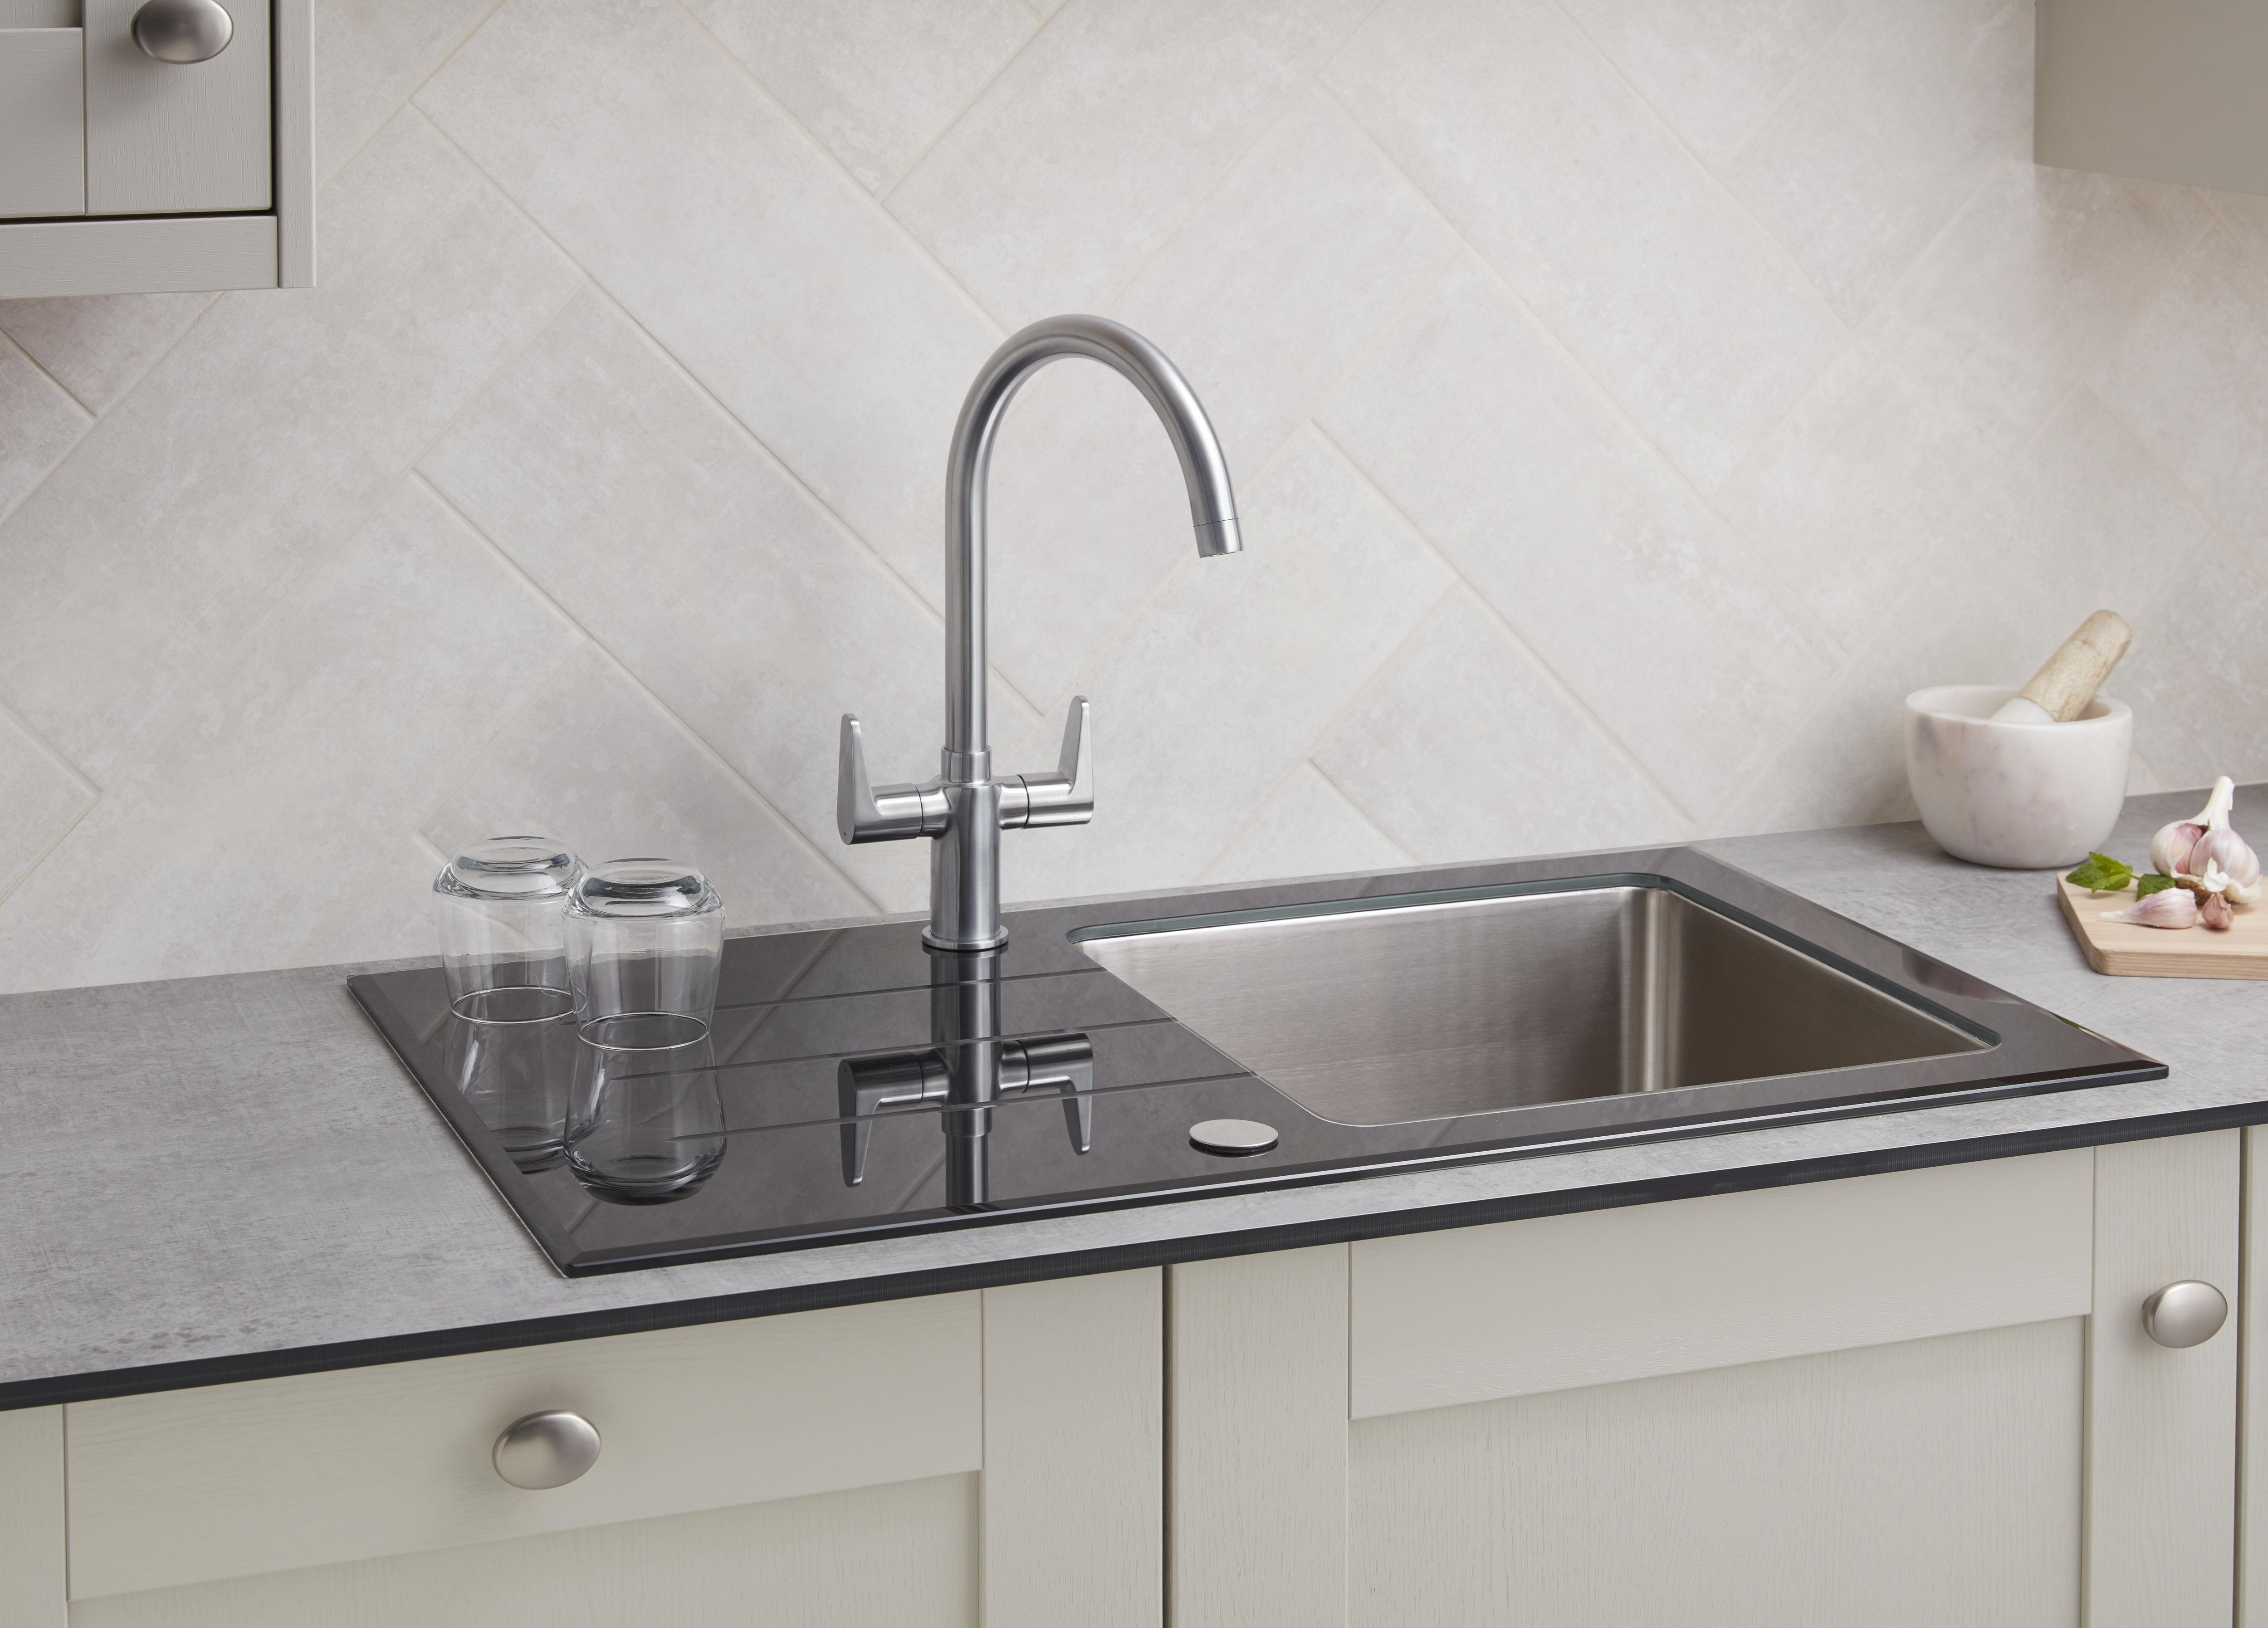 Delicieux Monobloc Tap Installed In Kitchen Sink